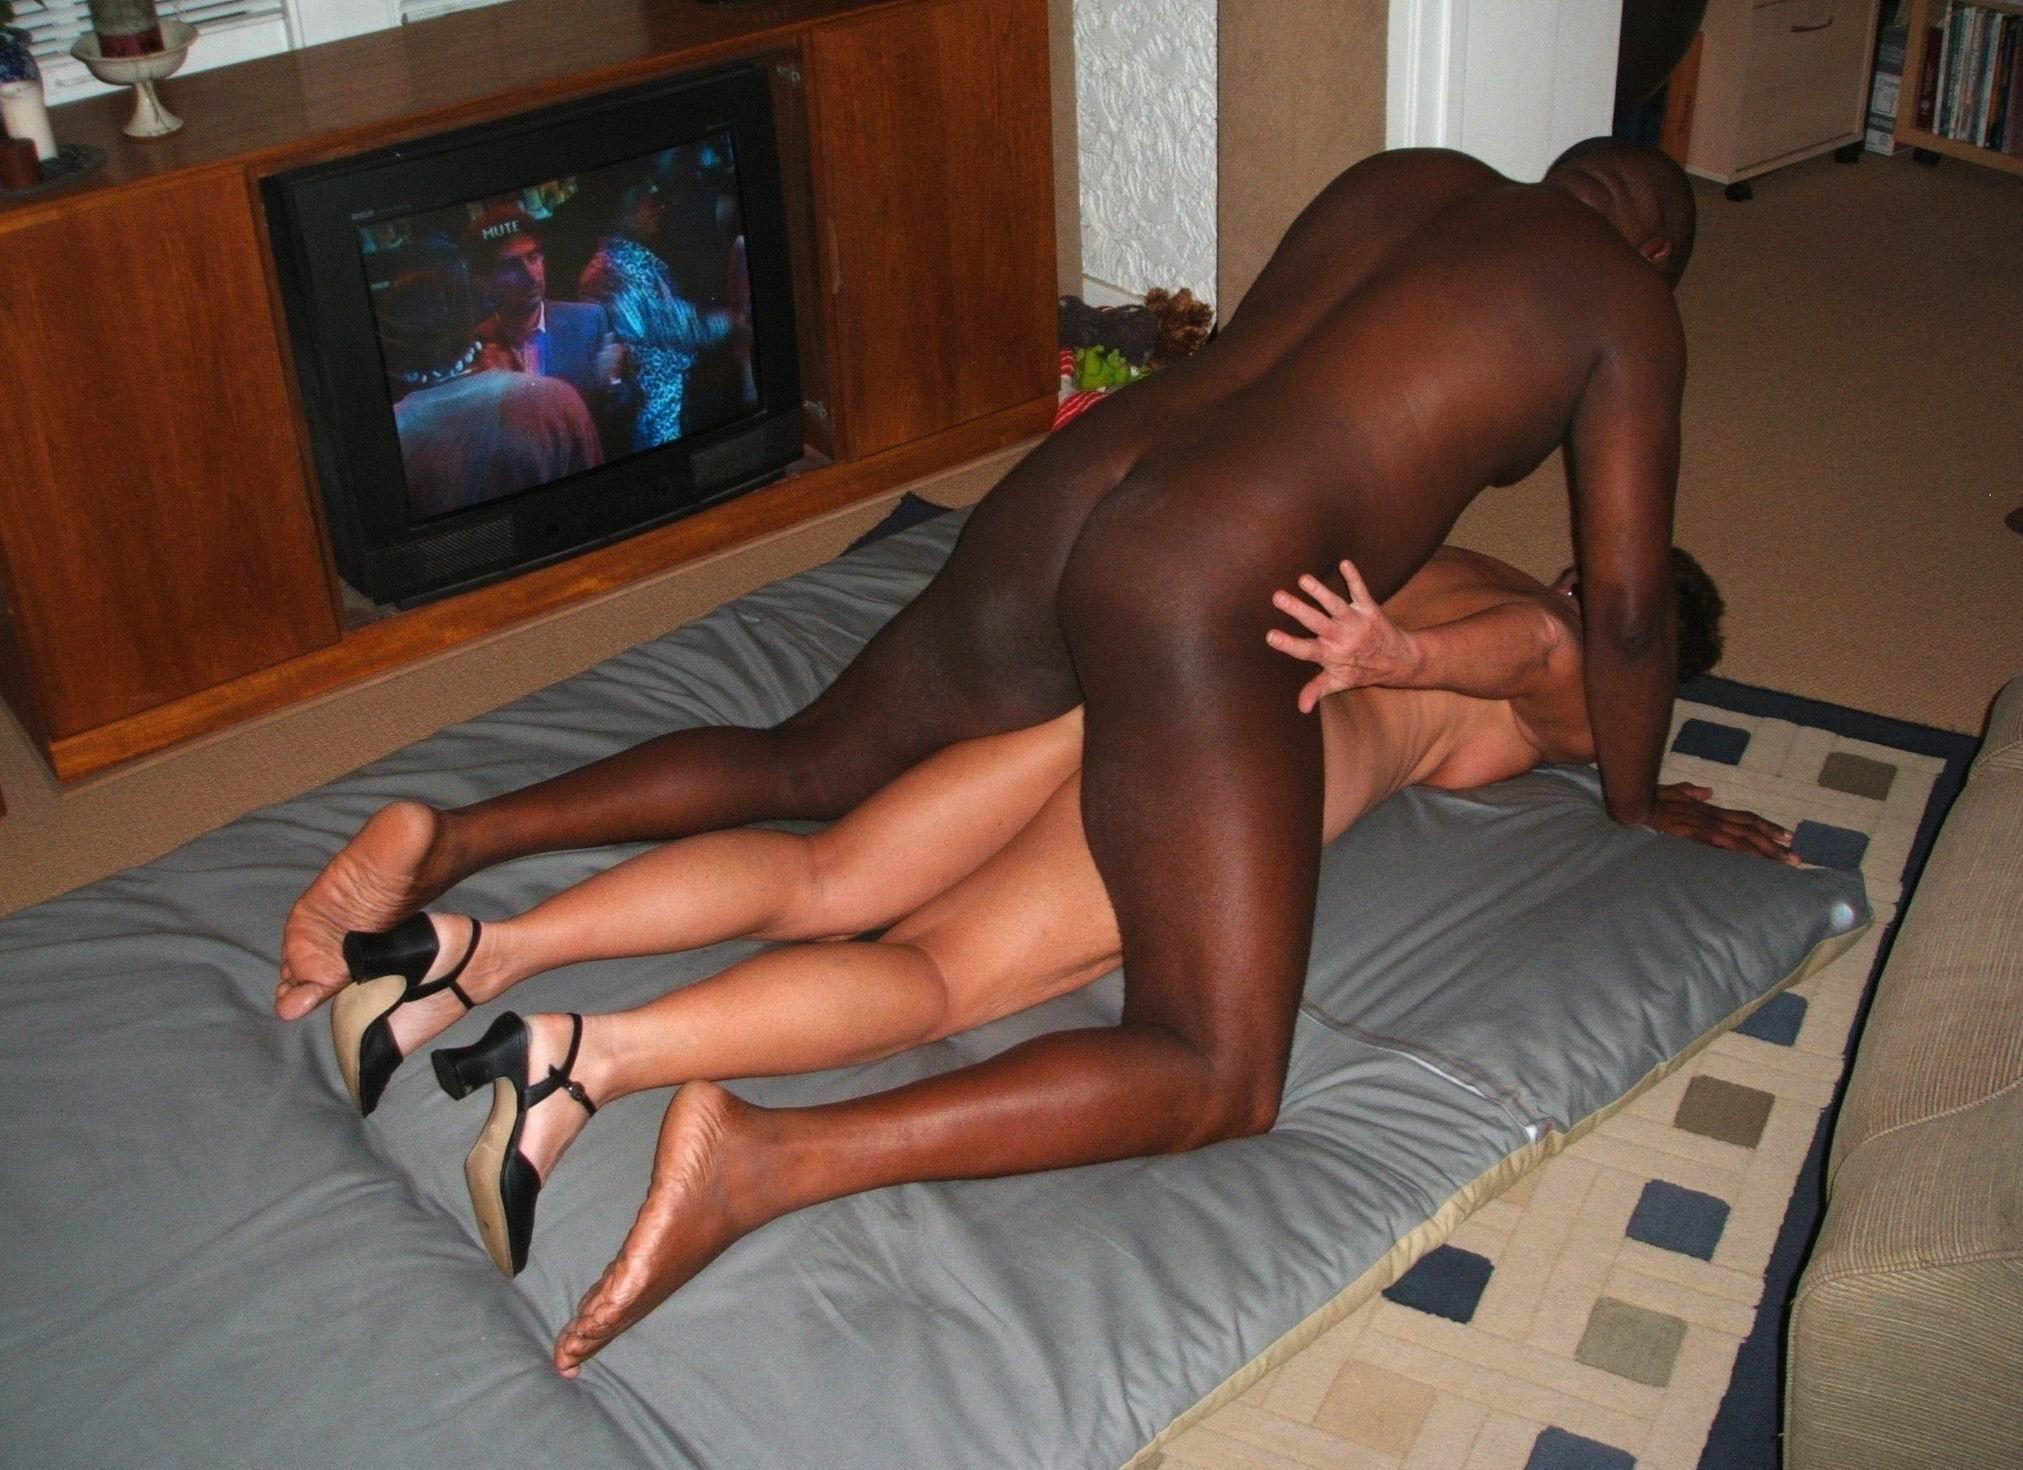 Freeonline pics blackmen cock women nude videos